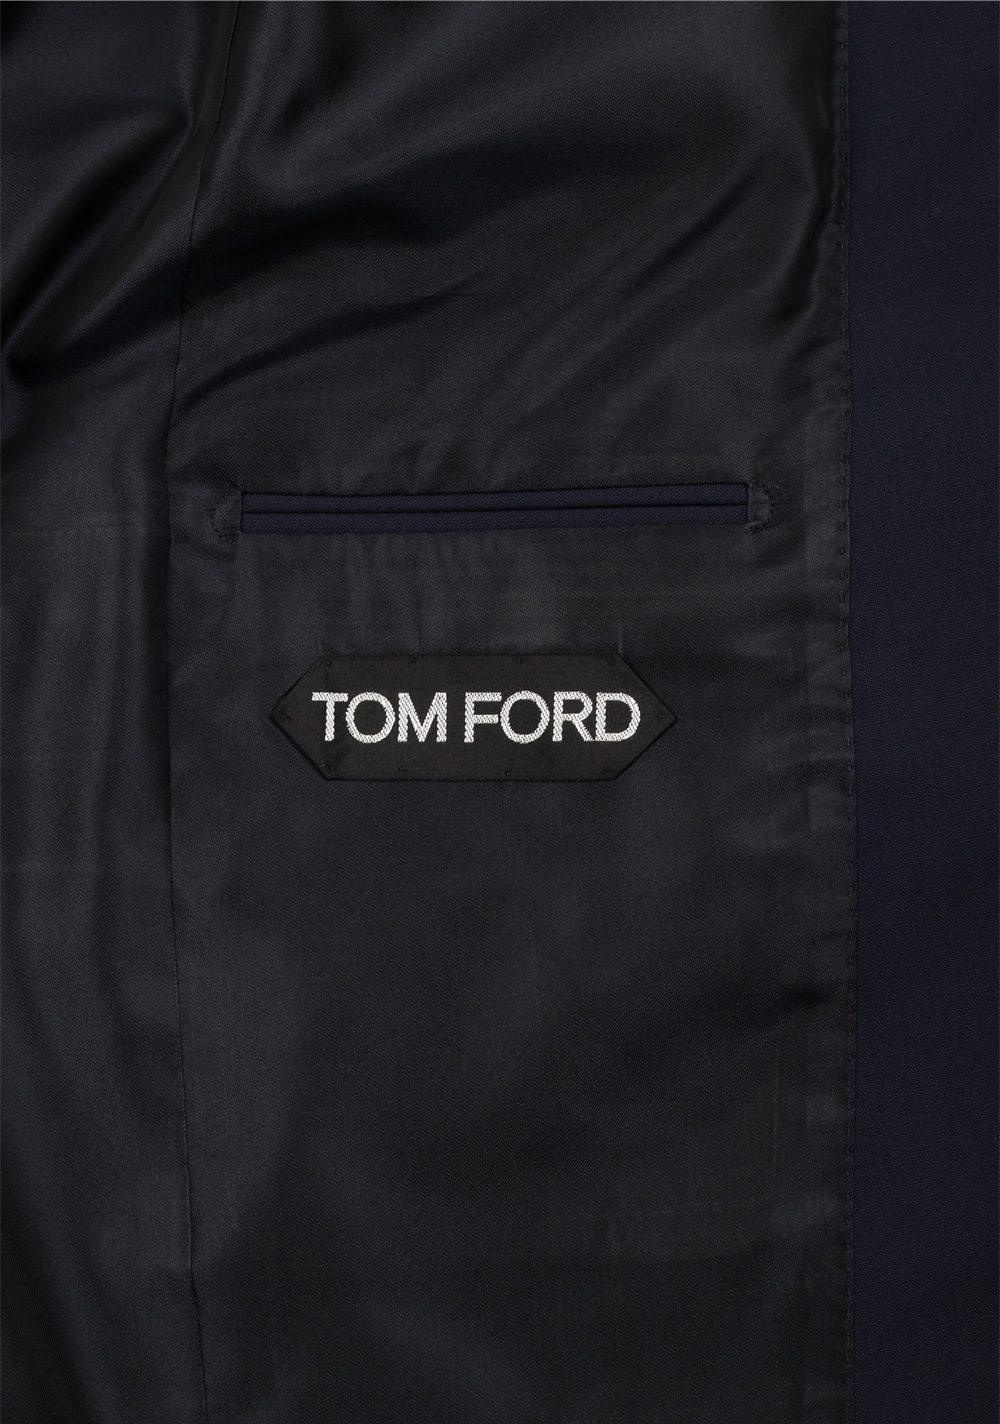 TOM FORD Windsor Signature Solid Blue 3 Piece Suit | Costume Limité